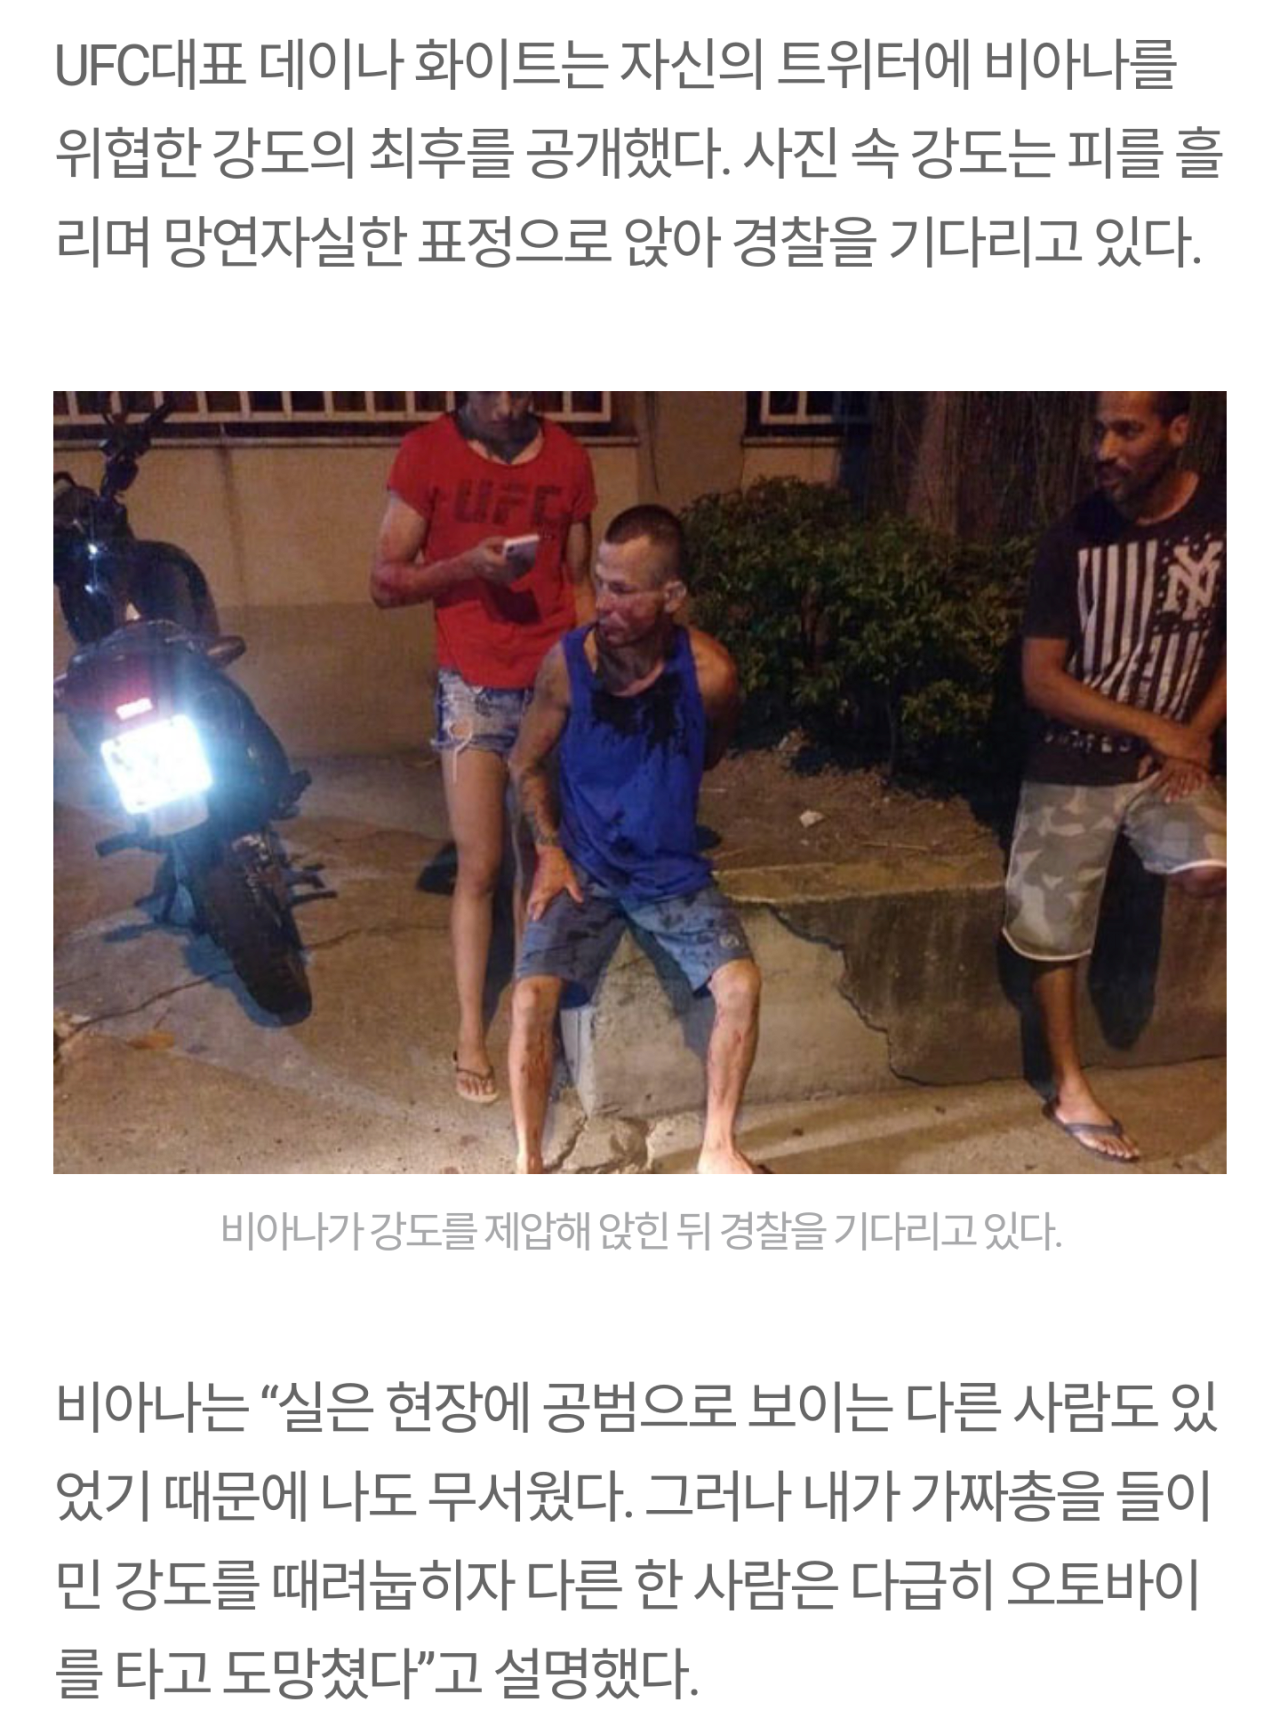 Screenshot_2020-09-26-23-42-32~2.png 브라질에서 강도짓하다 임자만난사람(혐).jpg